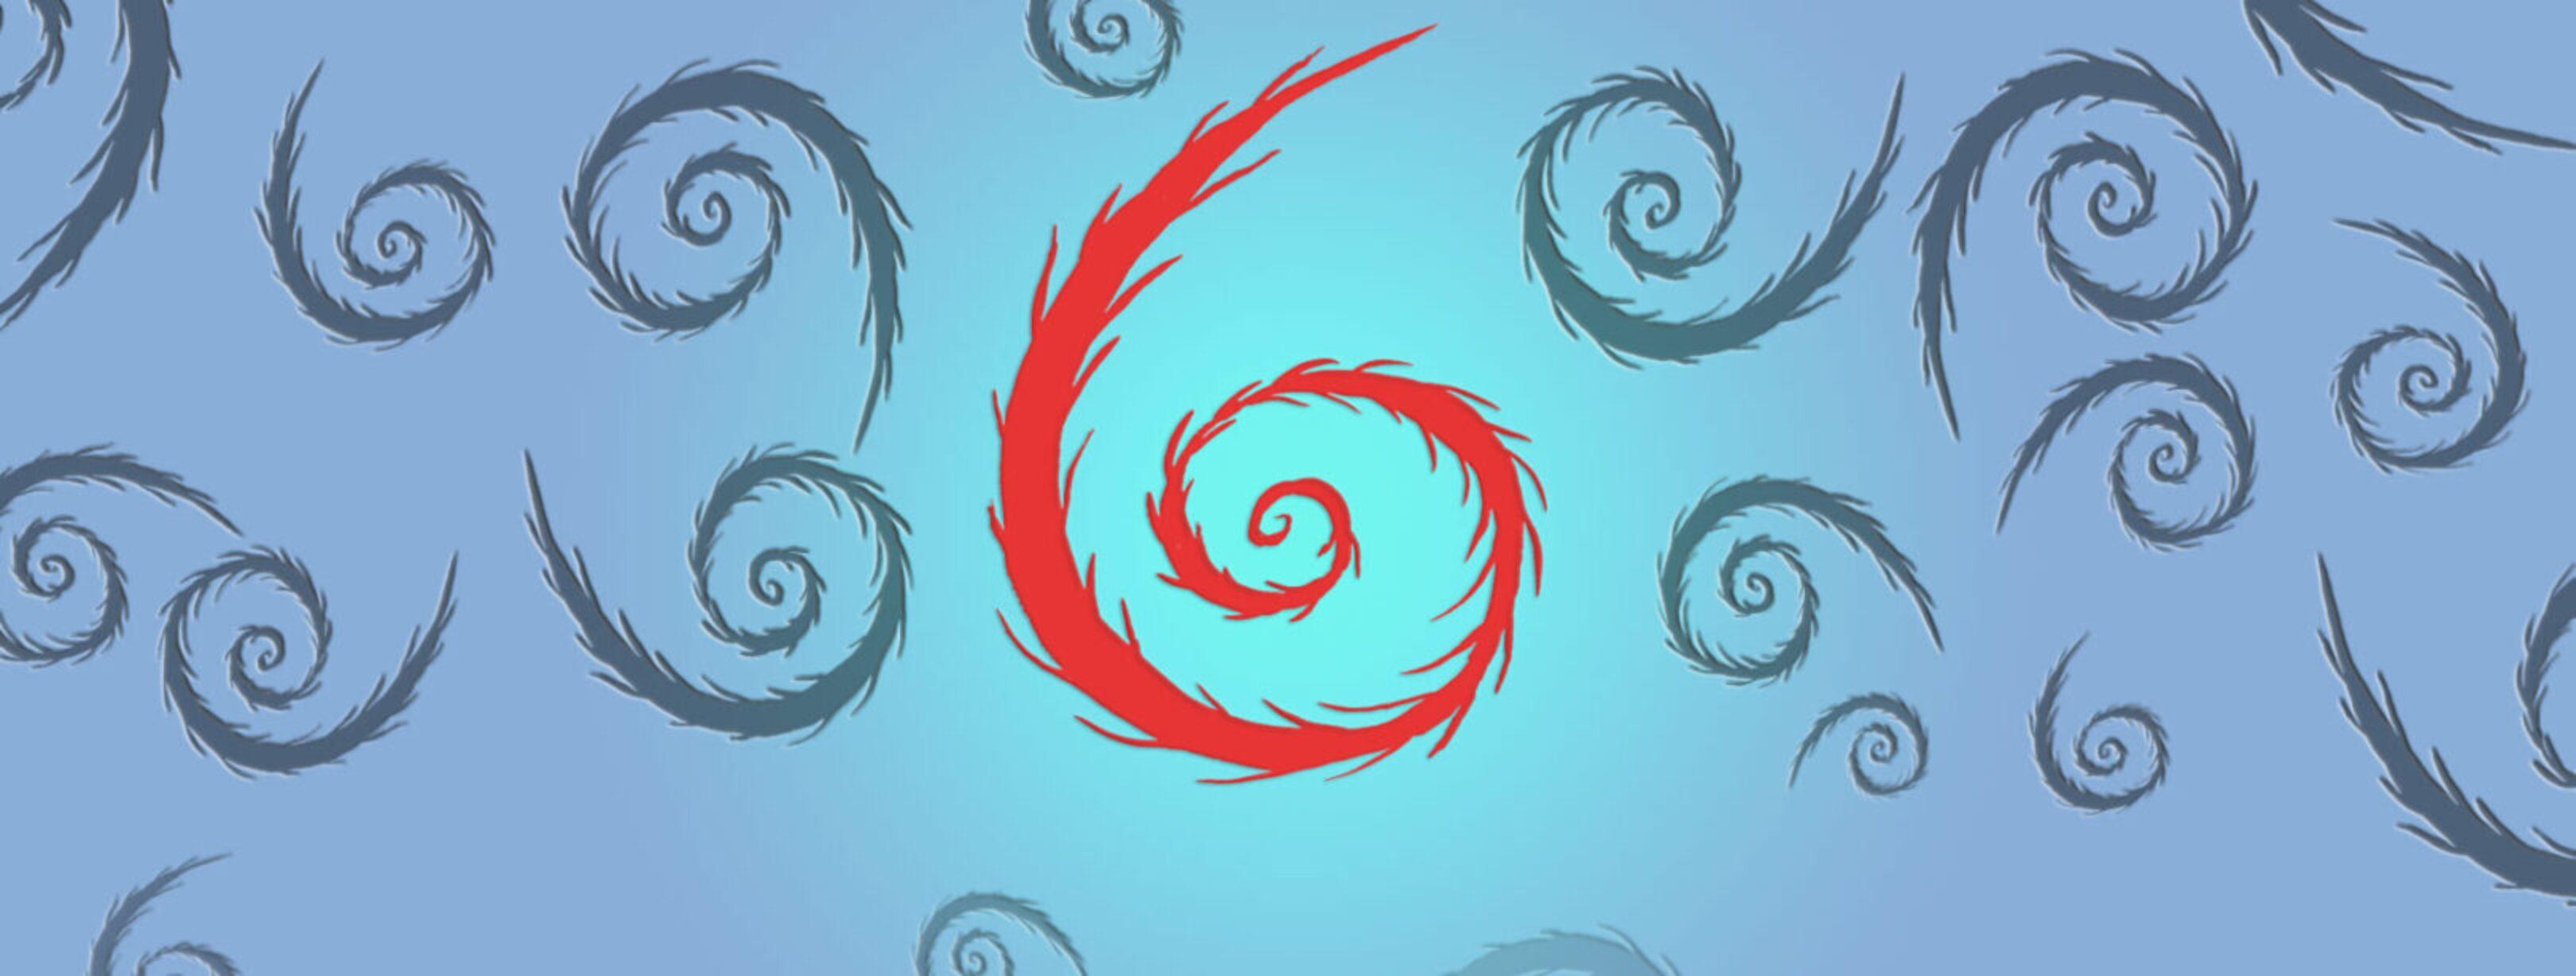 De-Zes-domeinen-header-spiralen-04